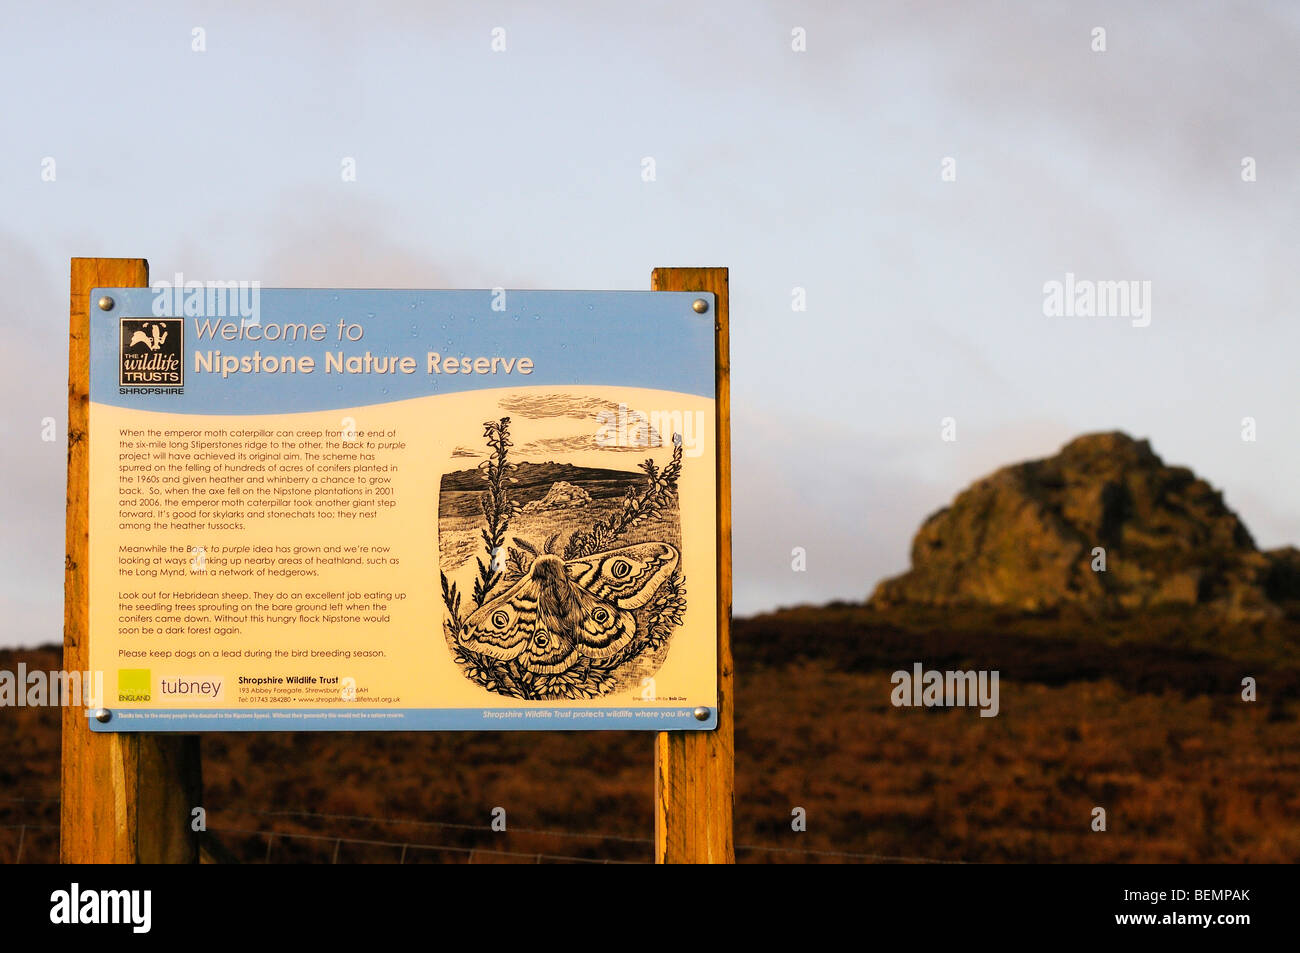 Nipstone Nature Reserve Interpretation sign Shropshire Hills England - Stock Image